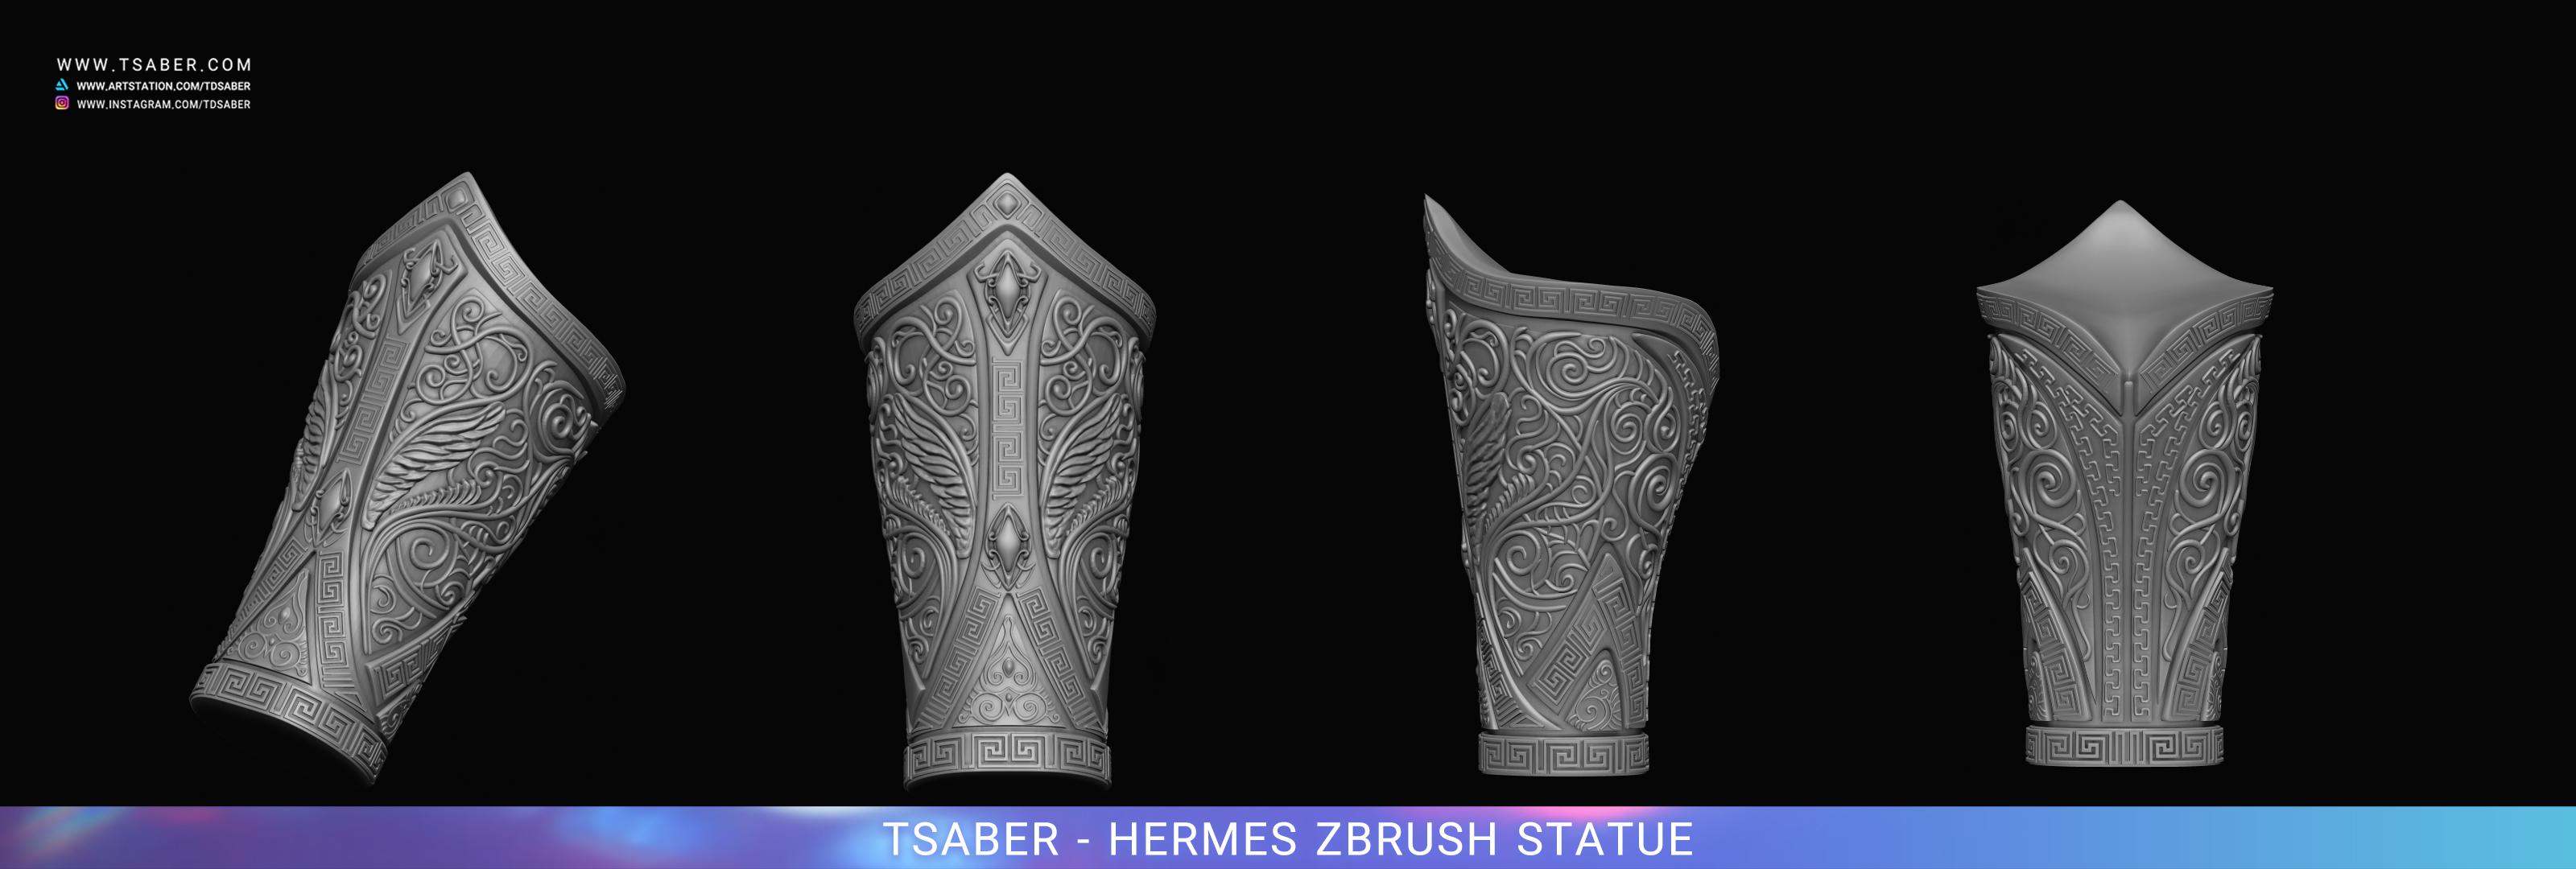 Making of Hermes Statue Zbrush - Blood of Zeus - Tsaber